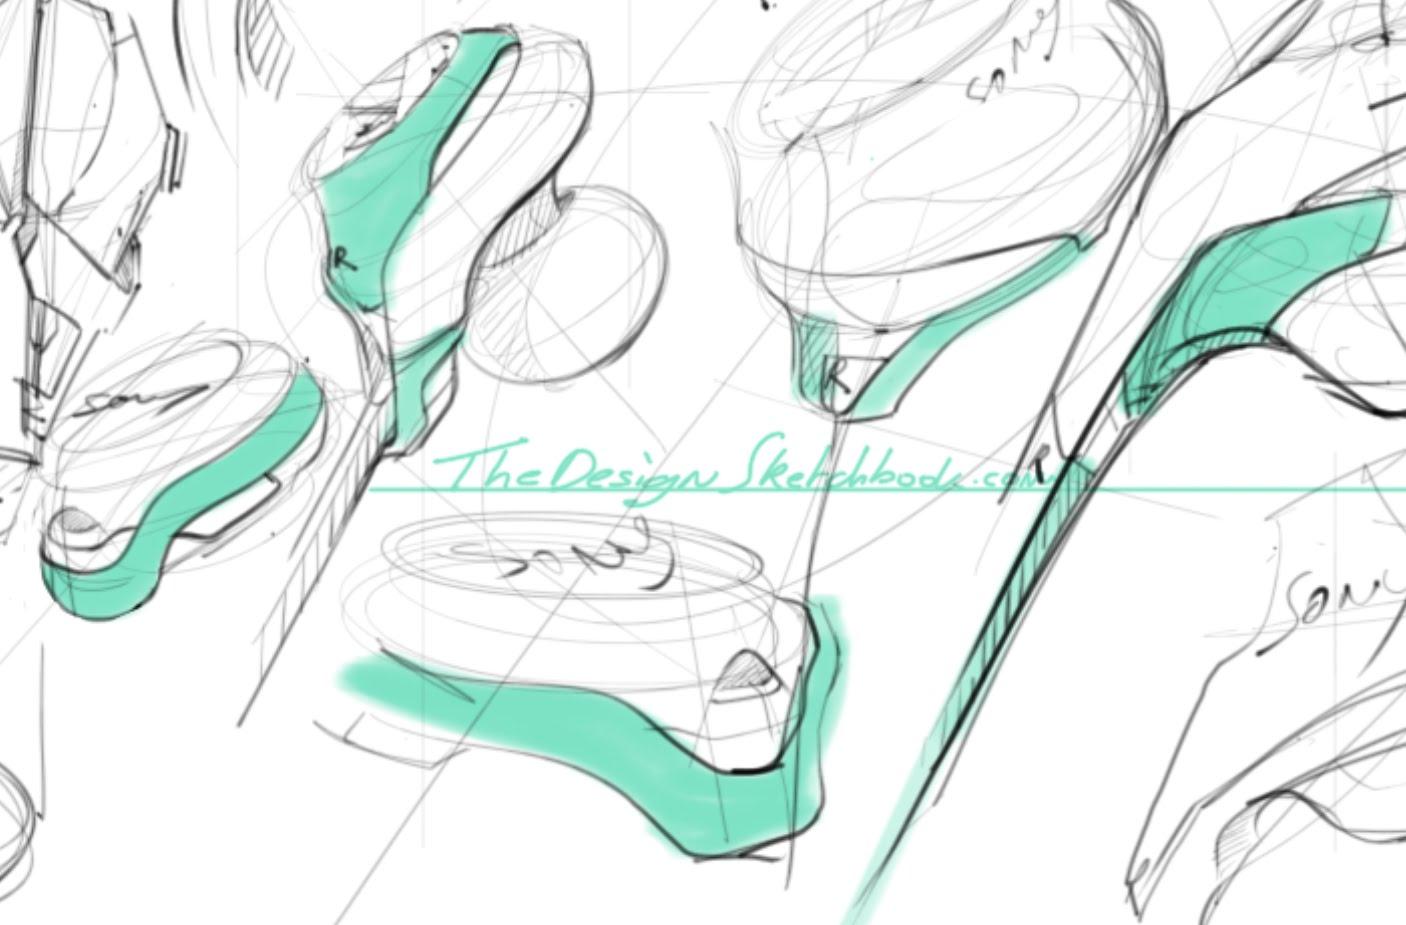 1406x925 Sketching Sony Earphone With Sketchbook Pro On Wacom Cintiq 22hd